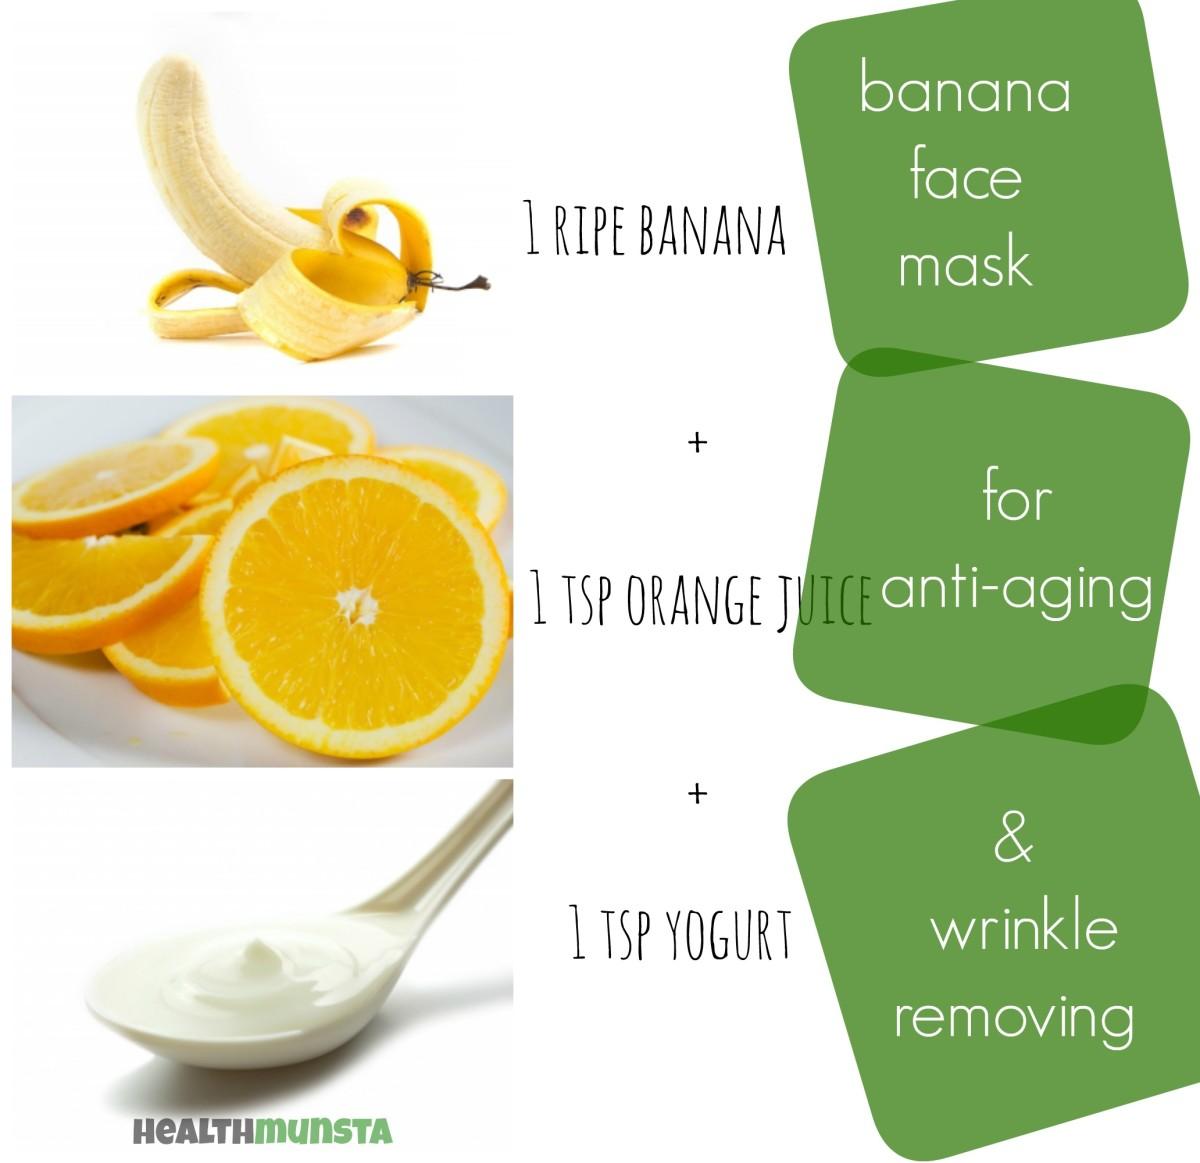 Banana Face Mask with yogurt and orange juice. Purpose: Anti-aging